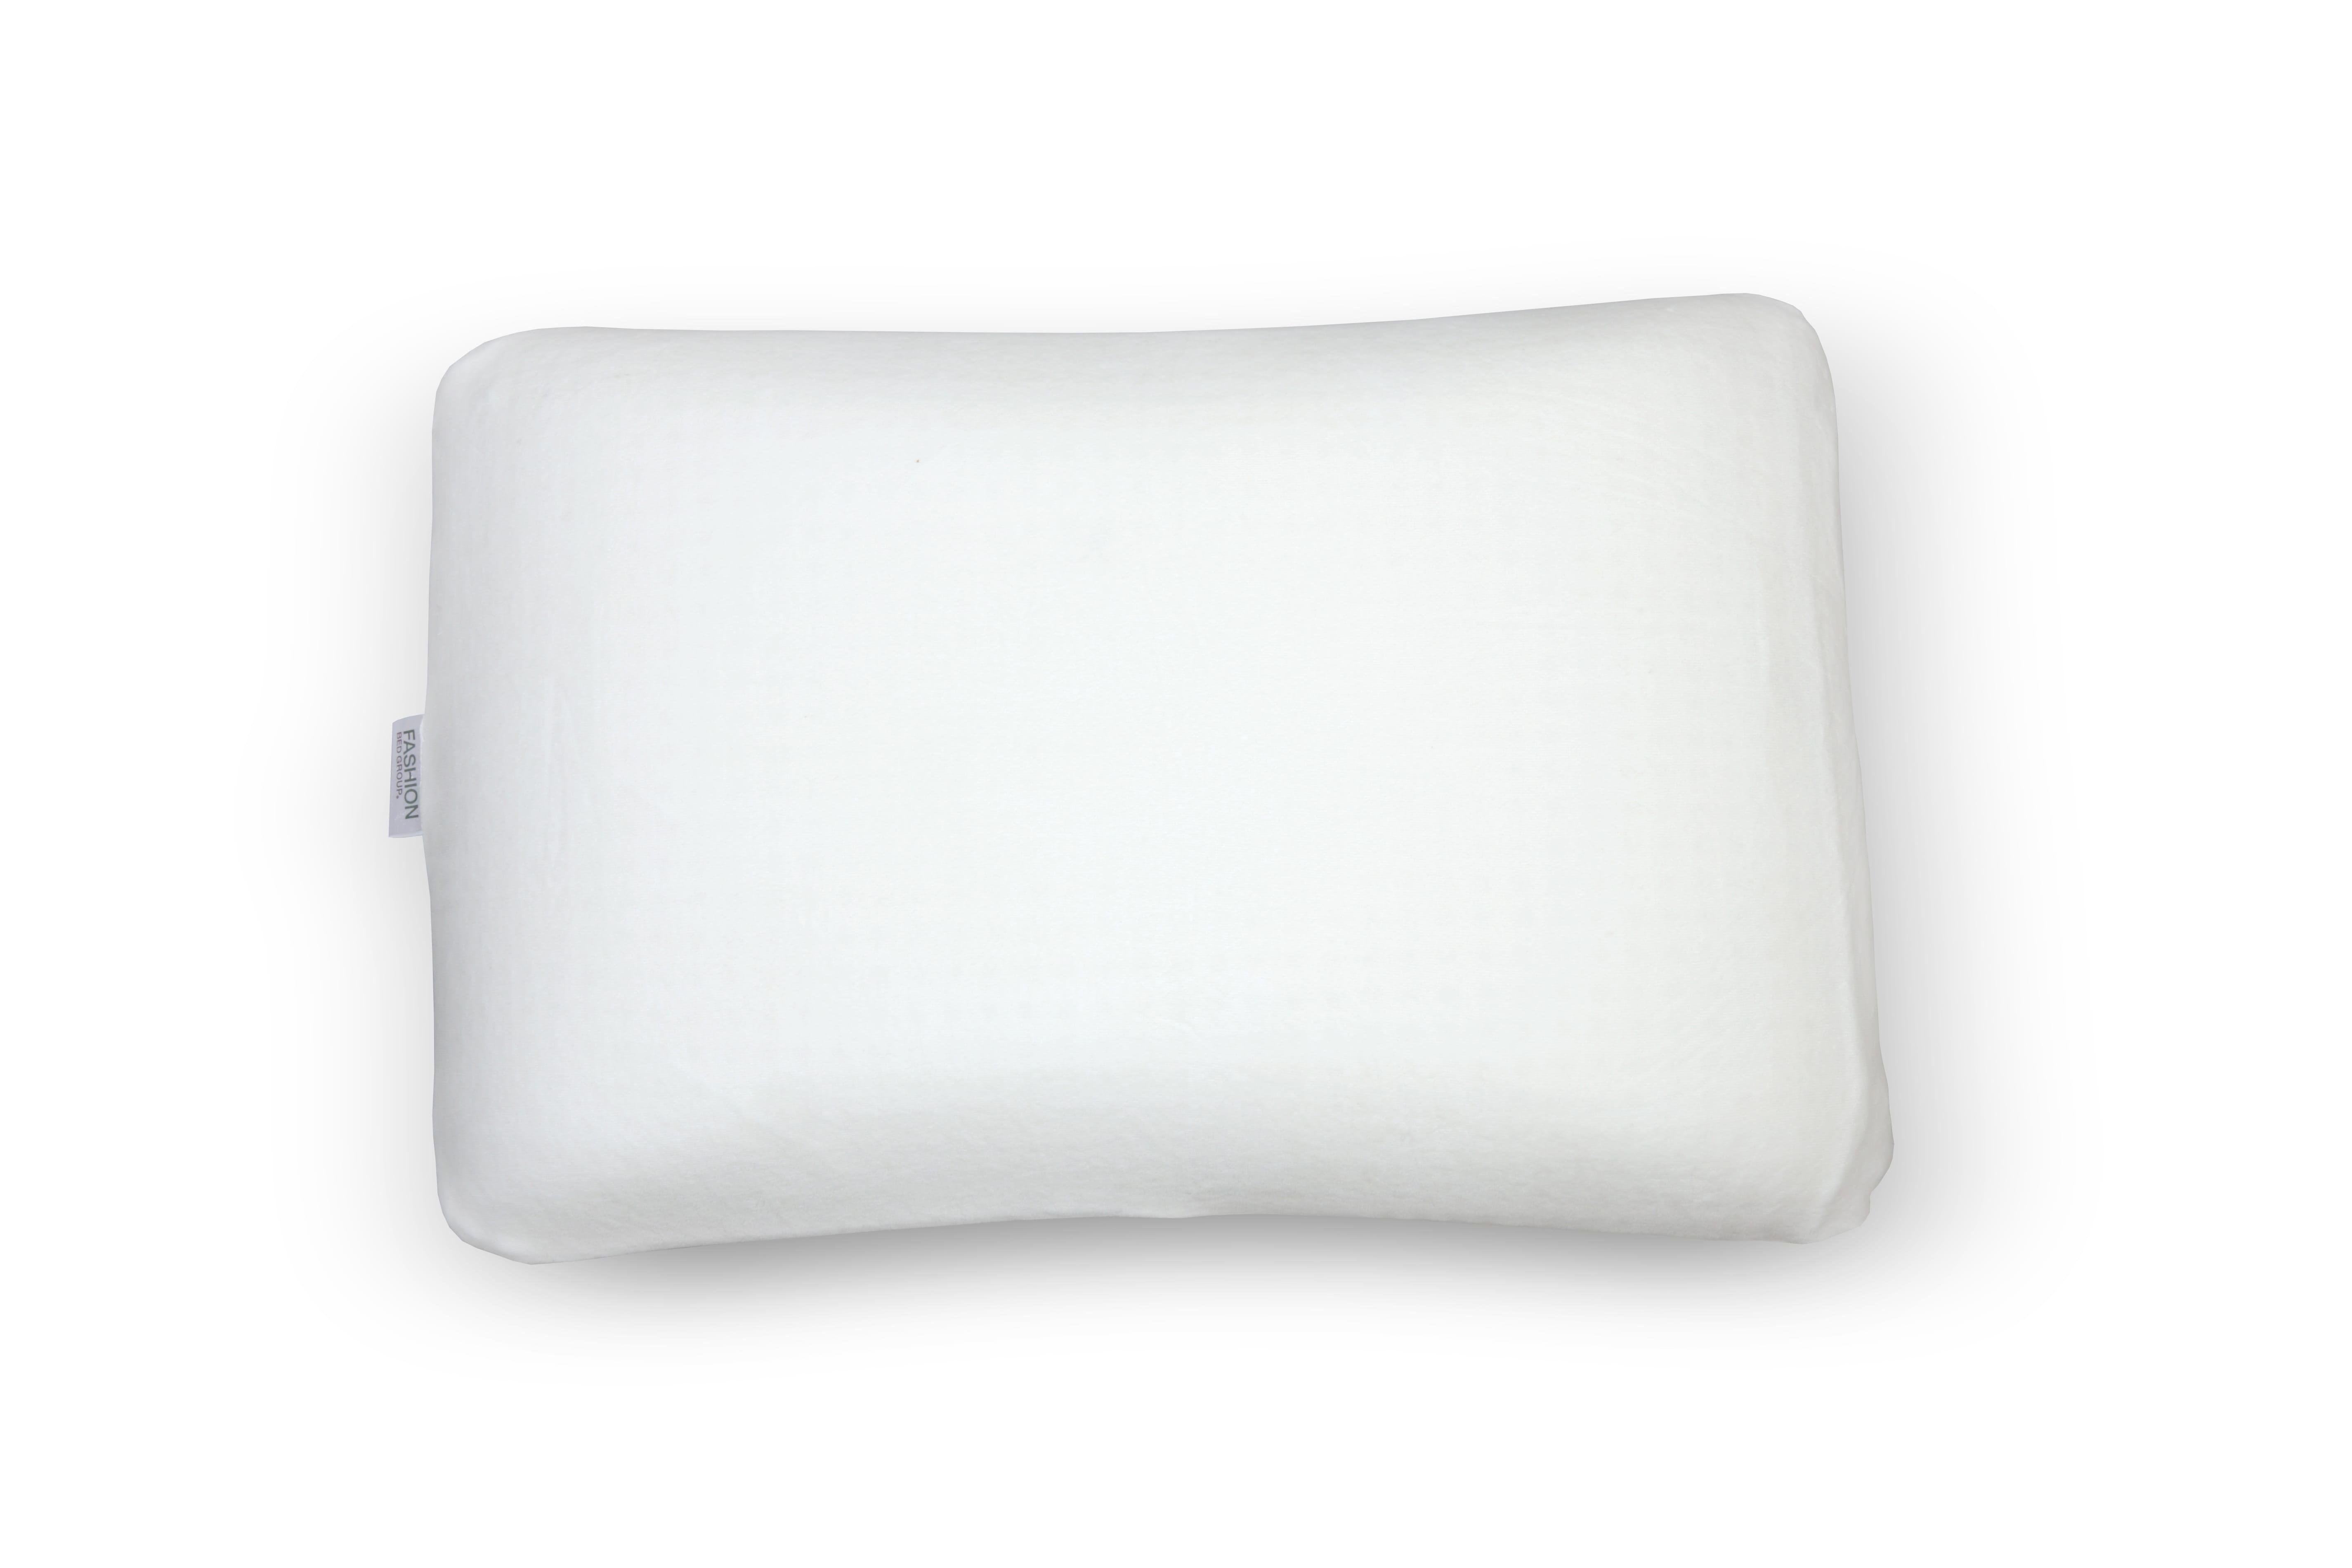 Fashion Bed Sleep Calm Memory Pillow